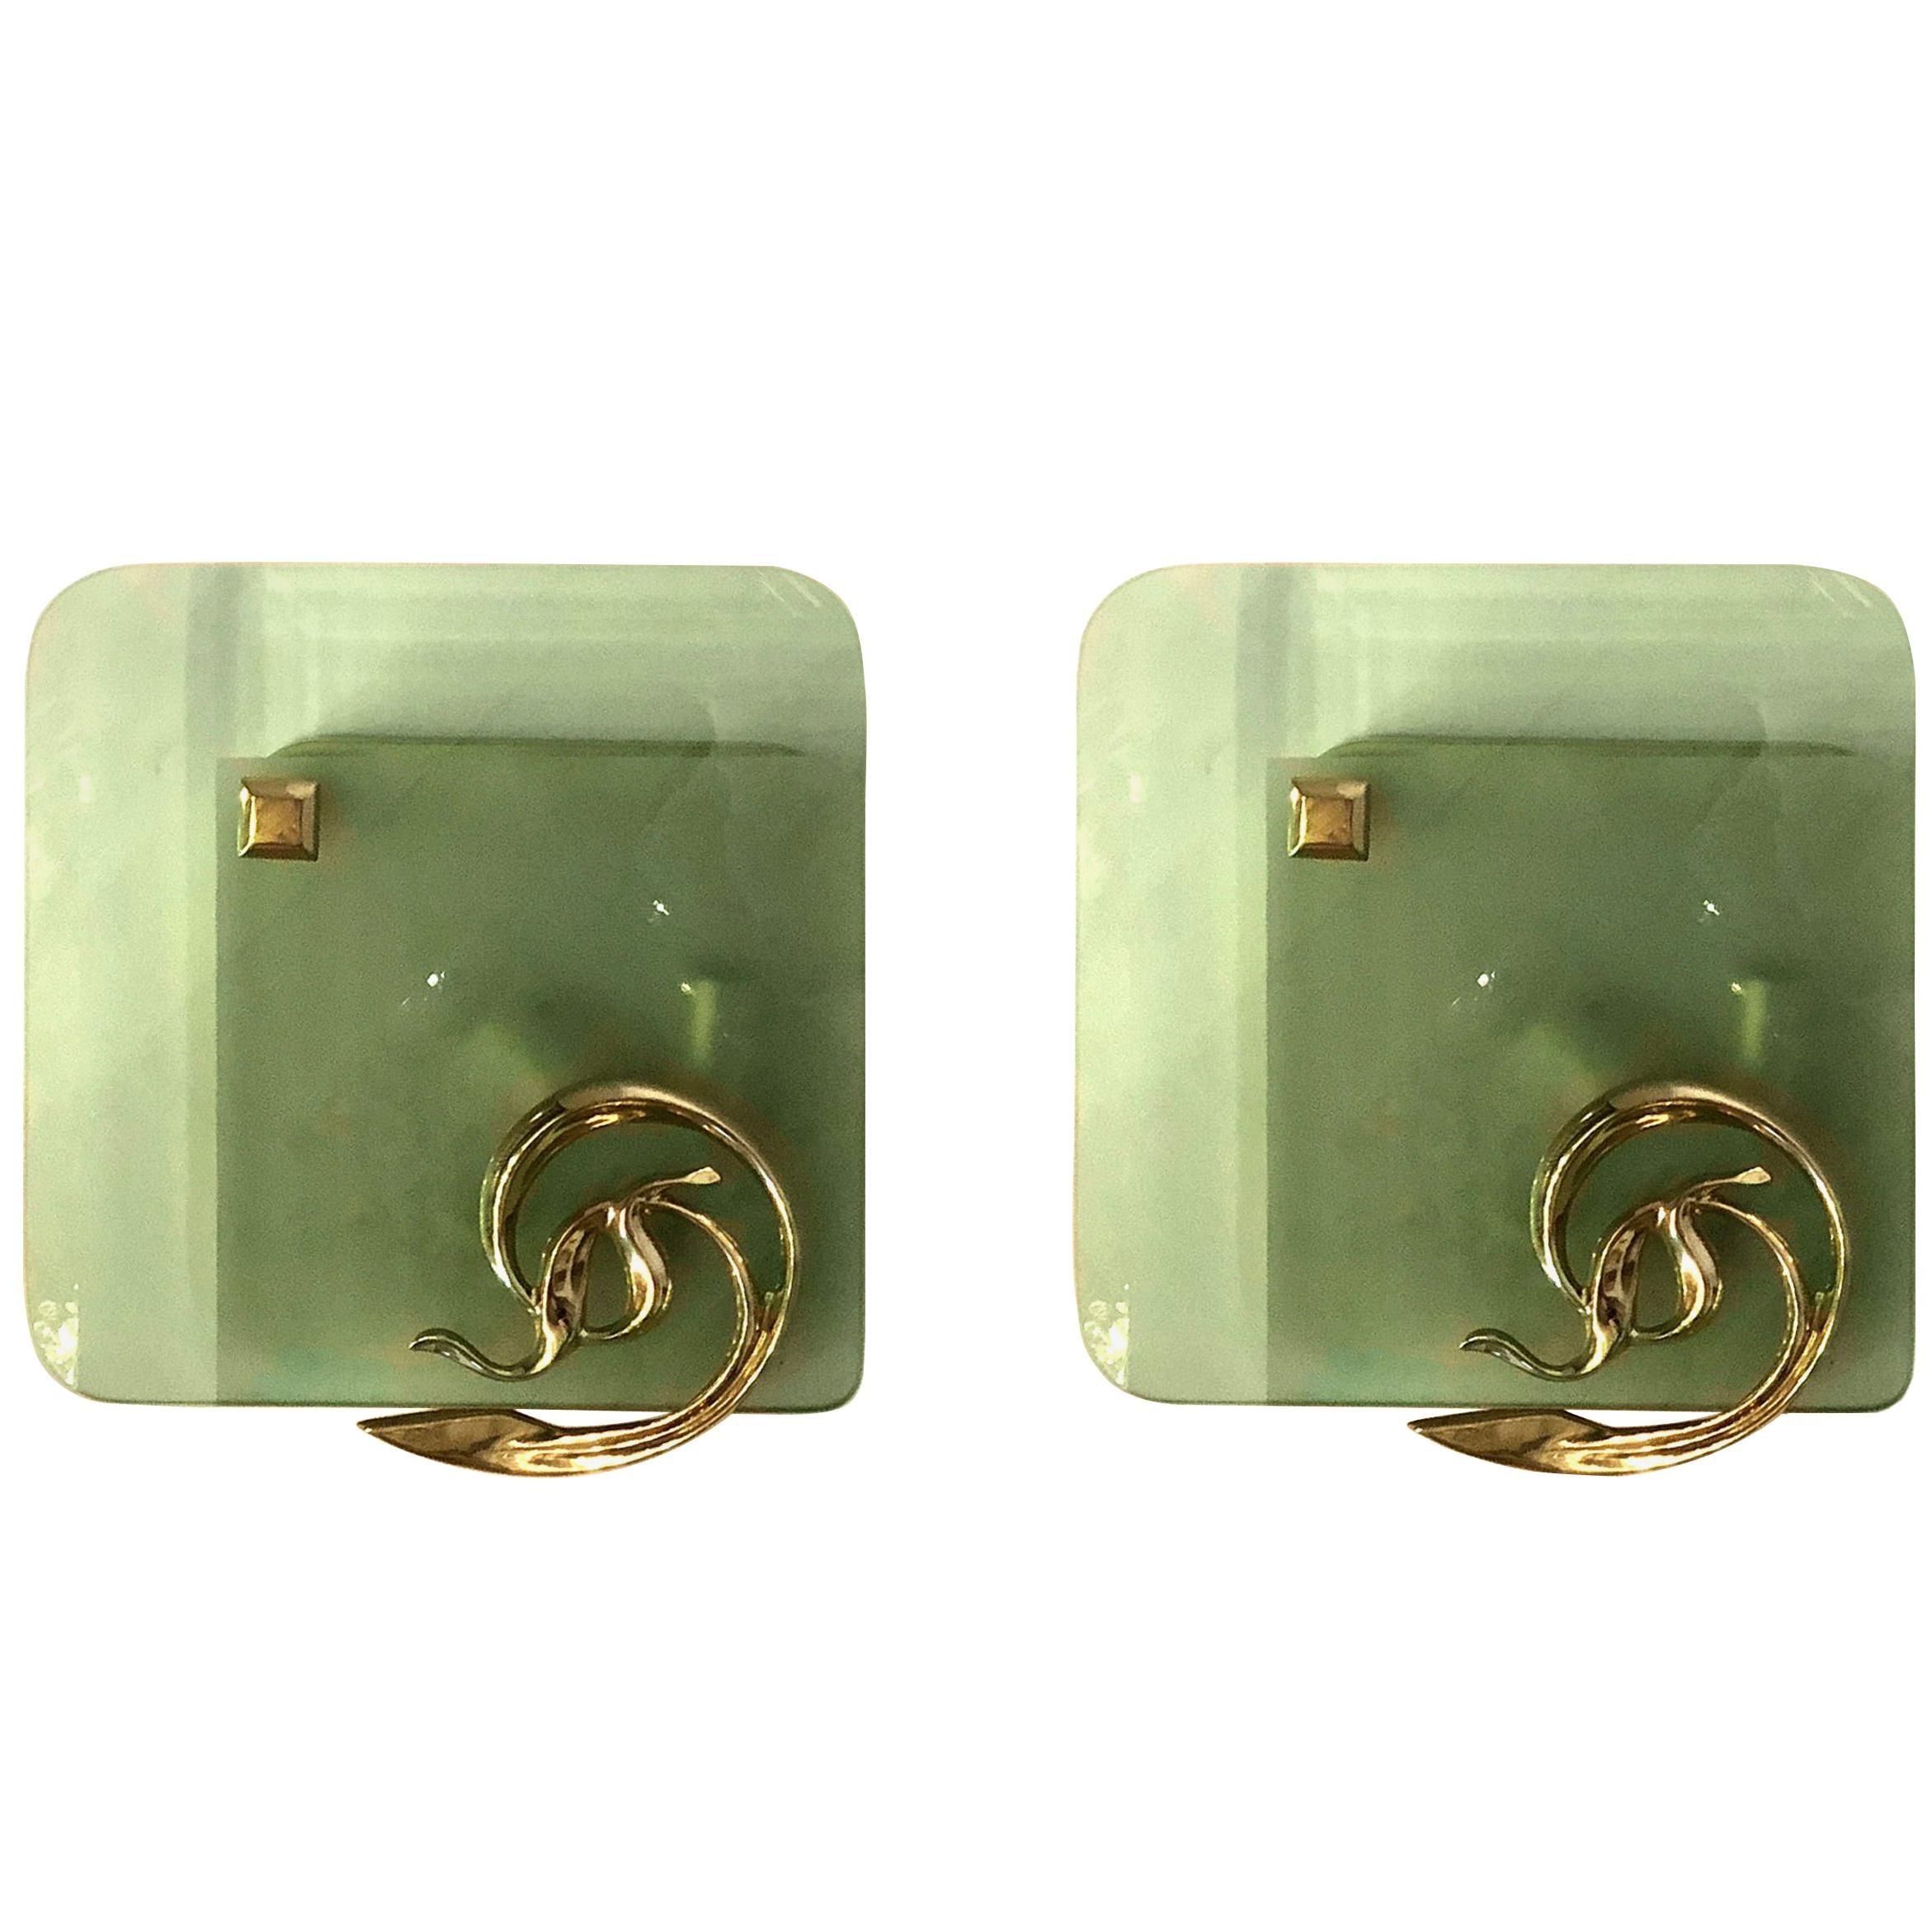 Pair of Italian Mid-Century Modern Brass/Glass Sconces, Fontana Arte Style 1960s